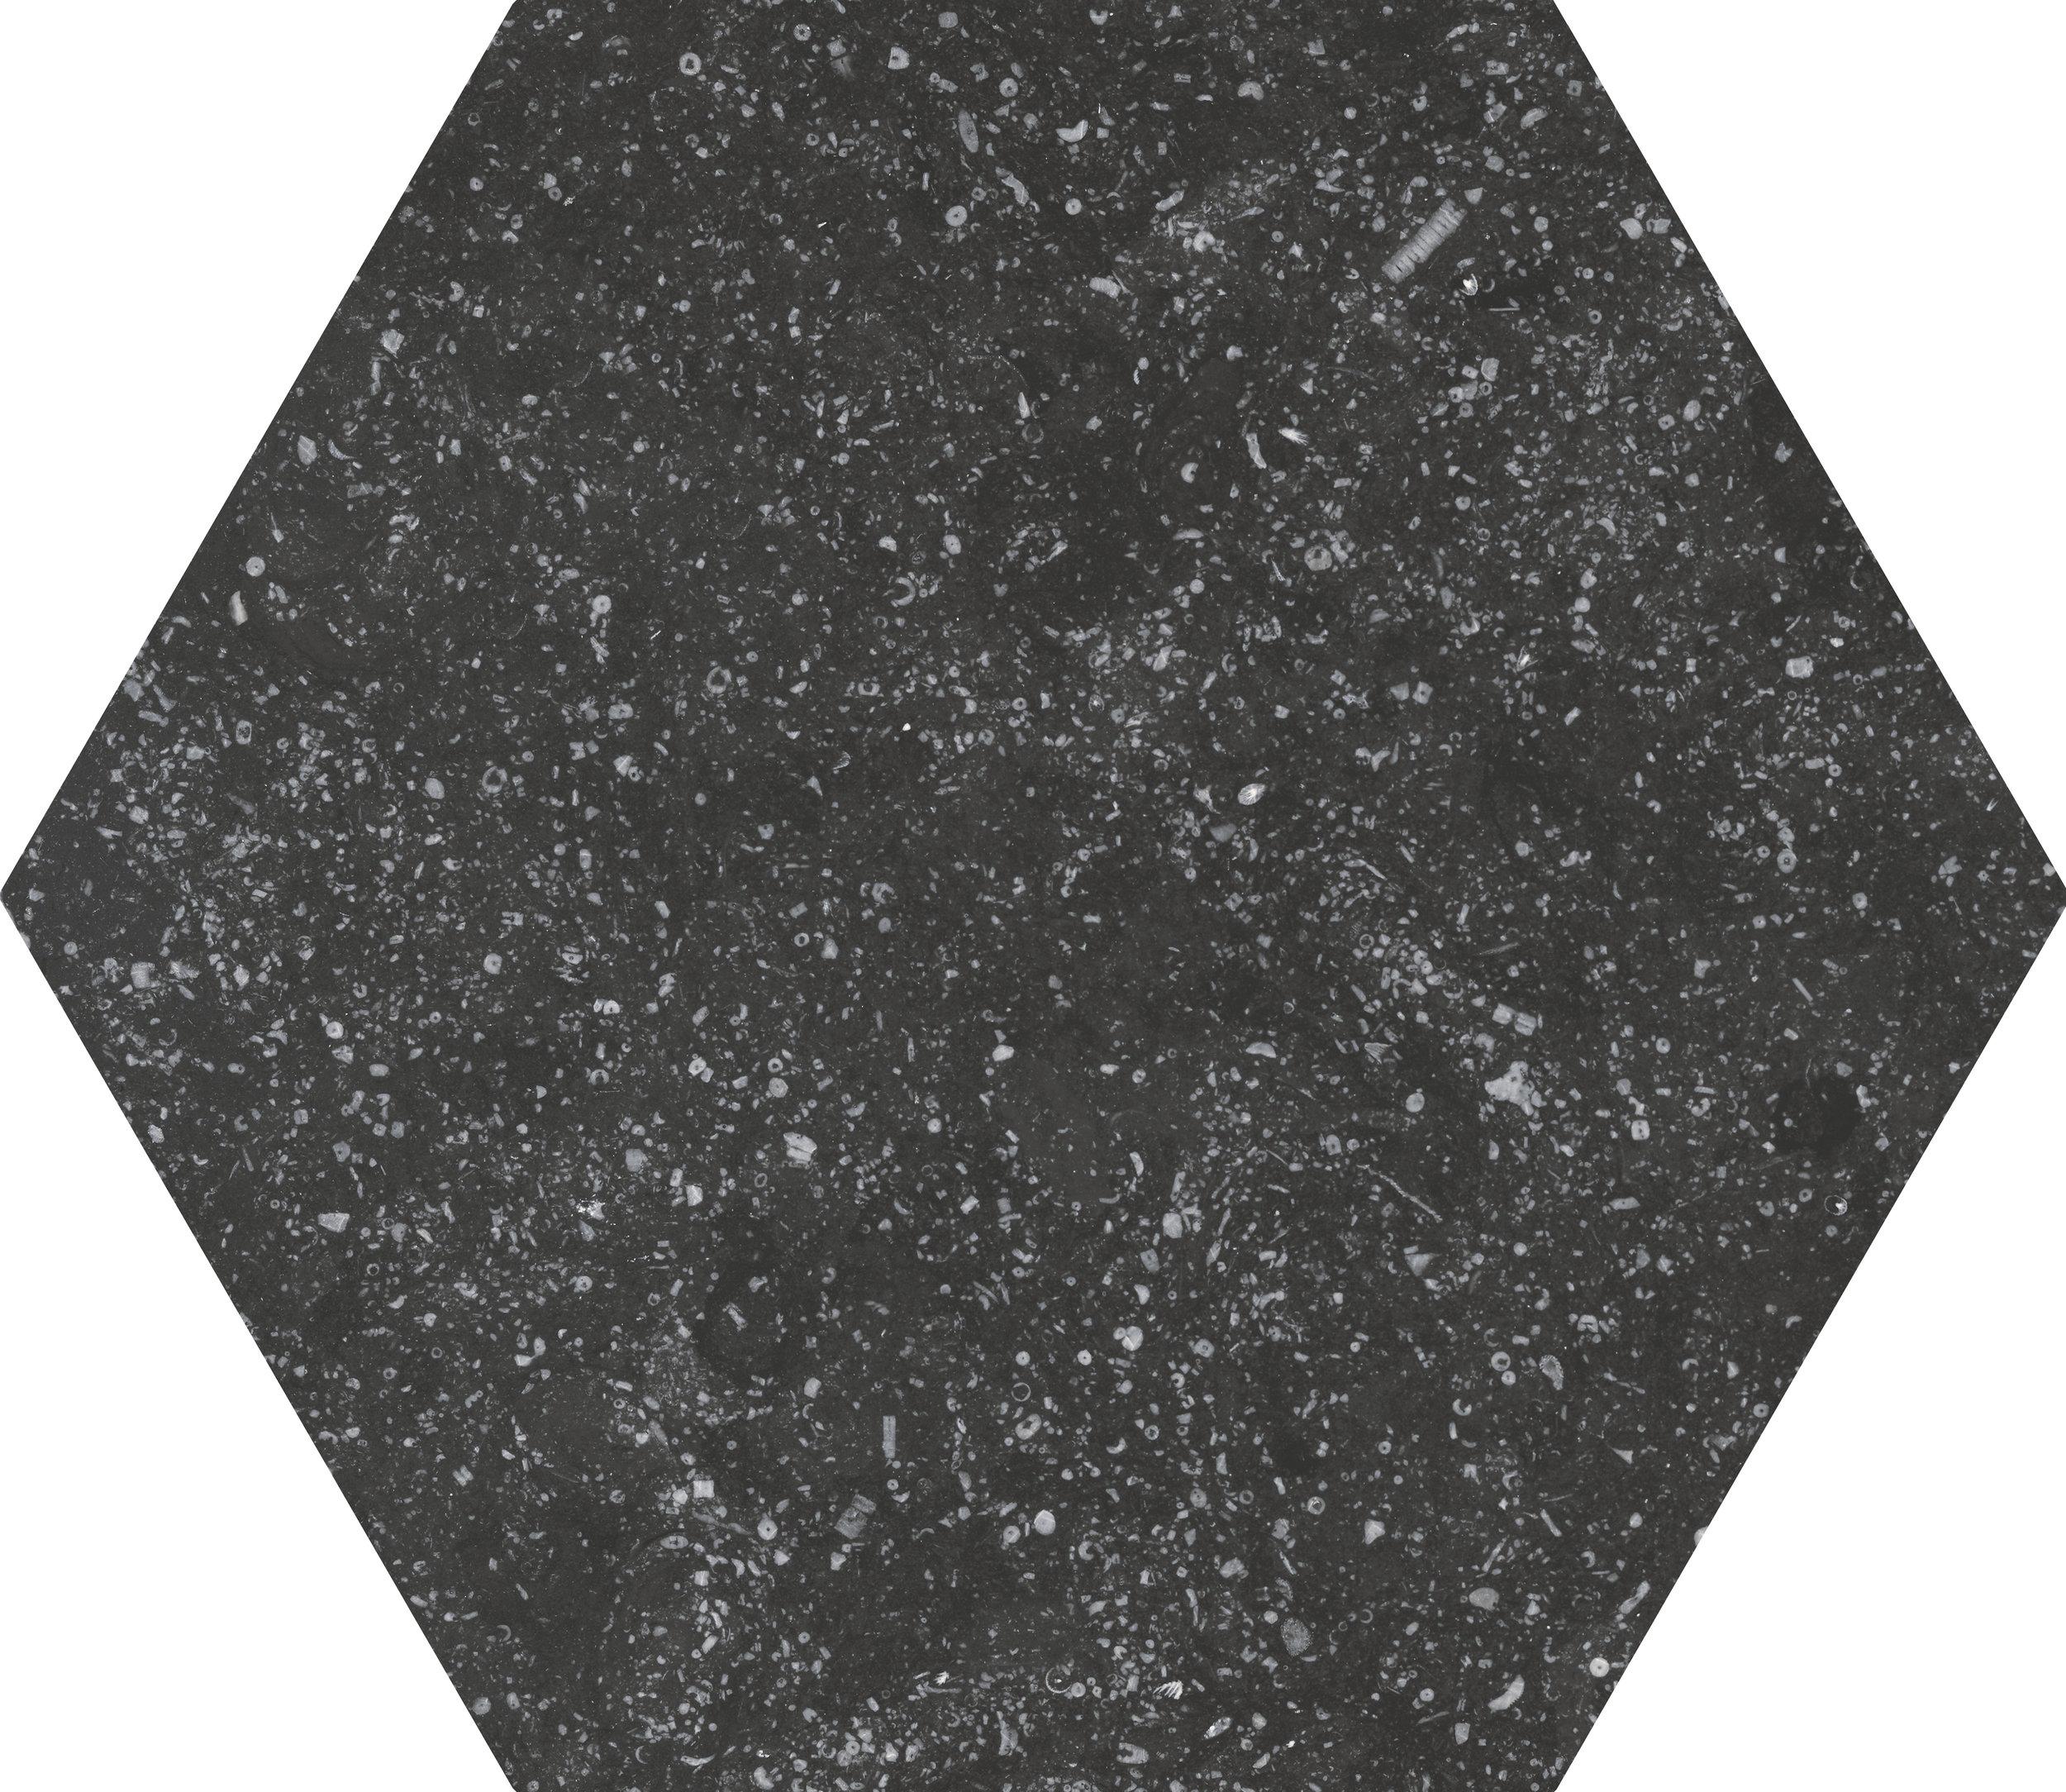 Coralstone Hexagon Black